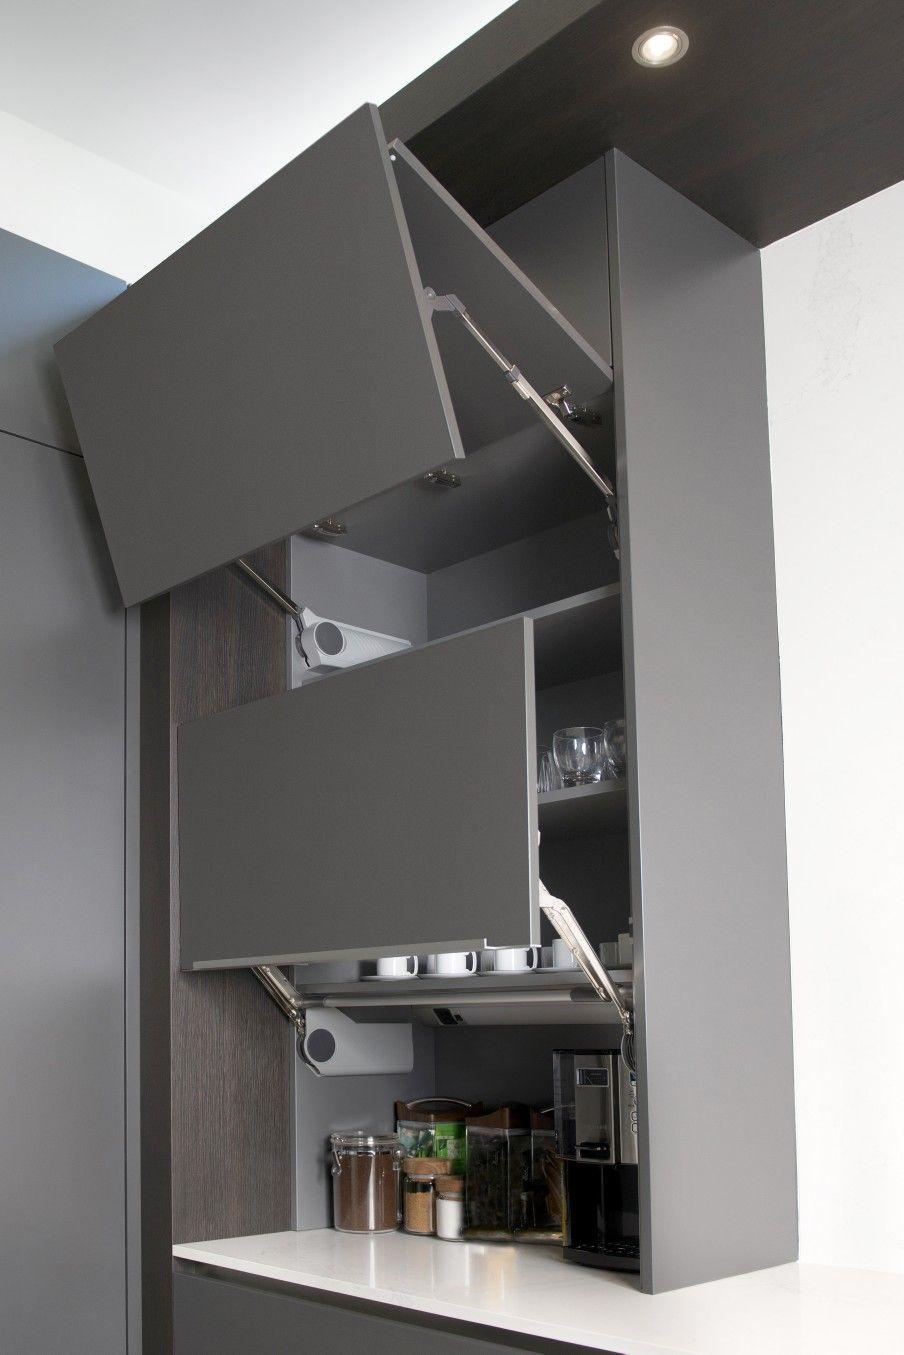 Eggersmann Usa Utilize Every Millimeter Storage Solutions Matte Grey Smoked Oak Kitchen Room Design Modern Kitchen Cabinets Modern Kitchen Design